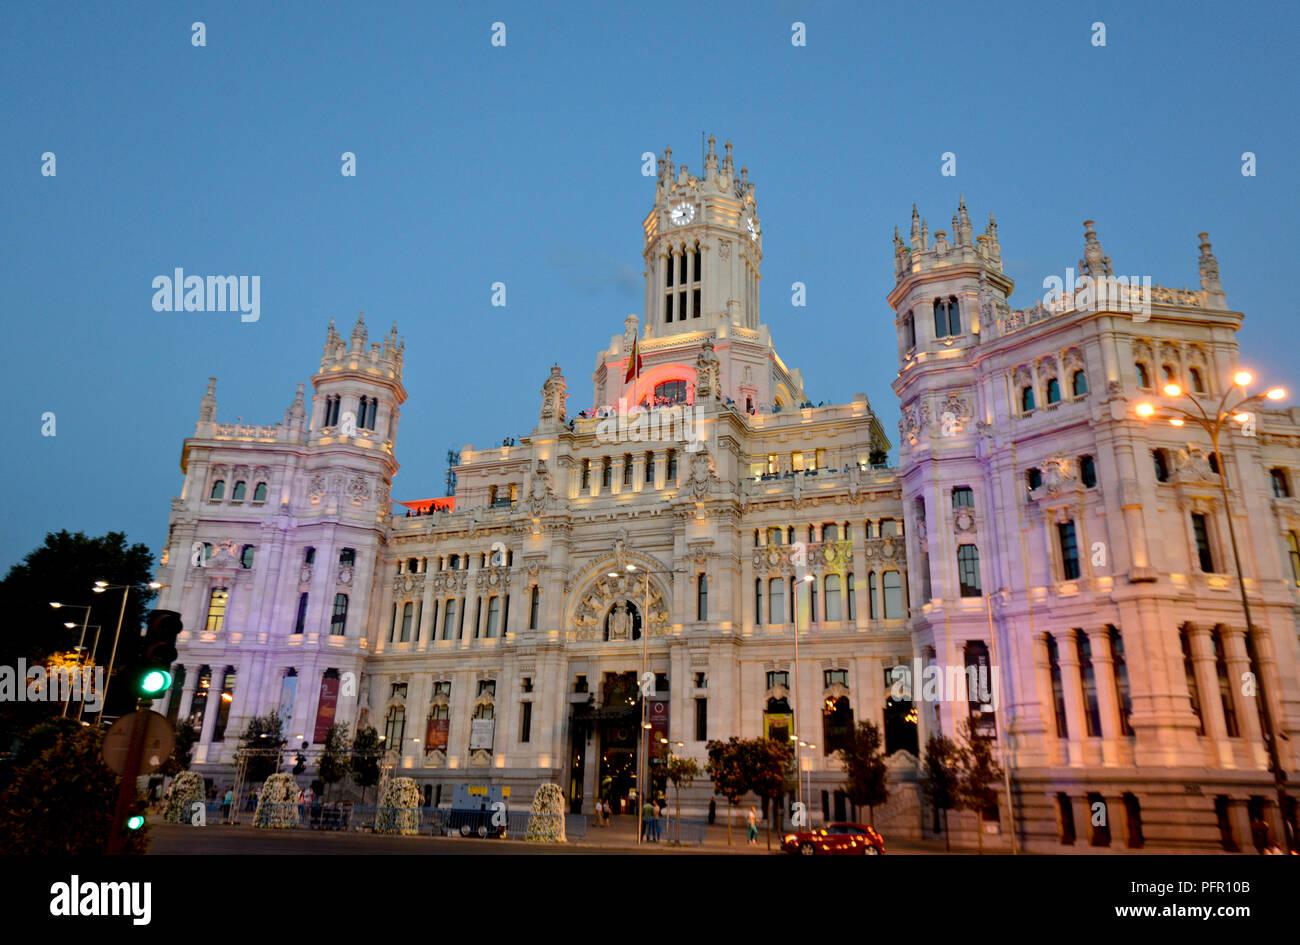 Cybele Palace Palacio De Cibeles Madrid Spain Stock